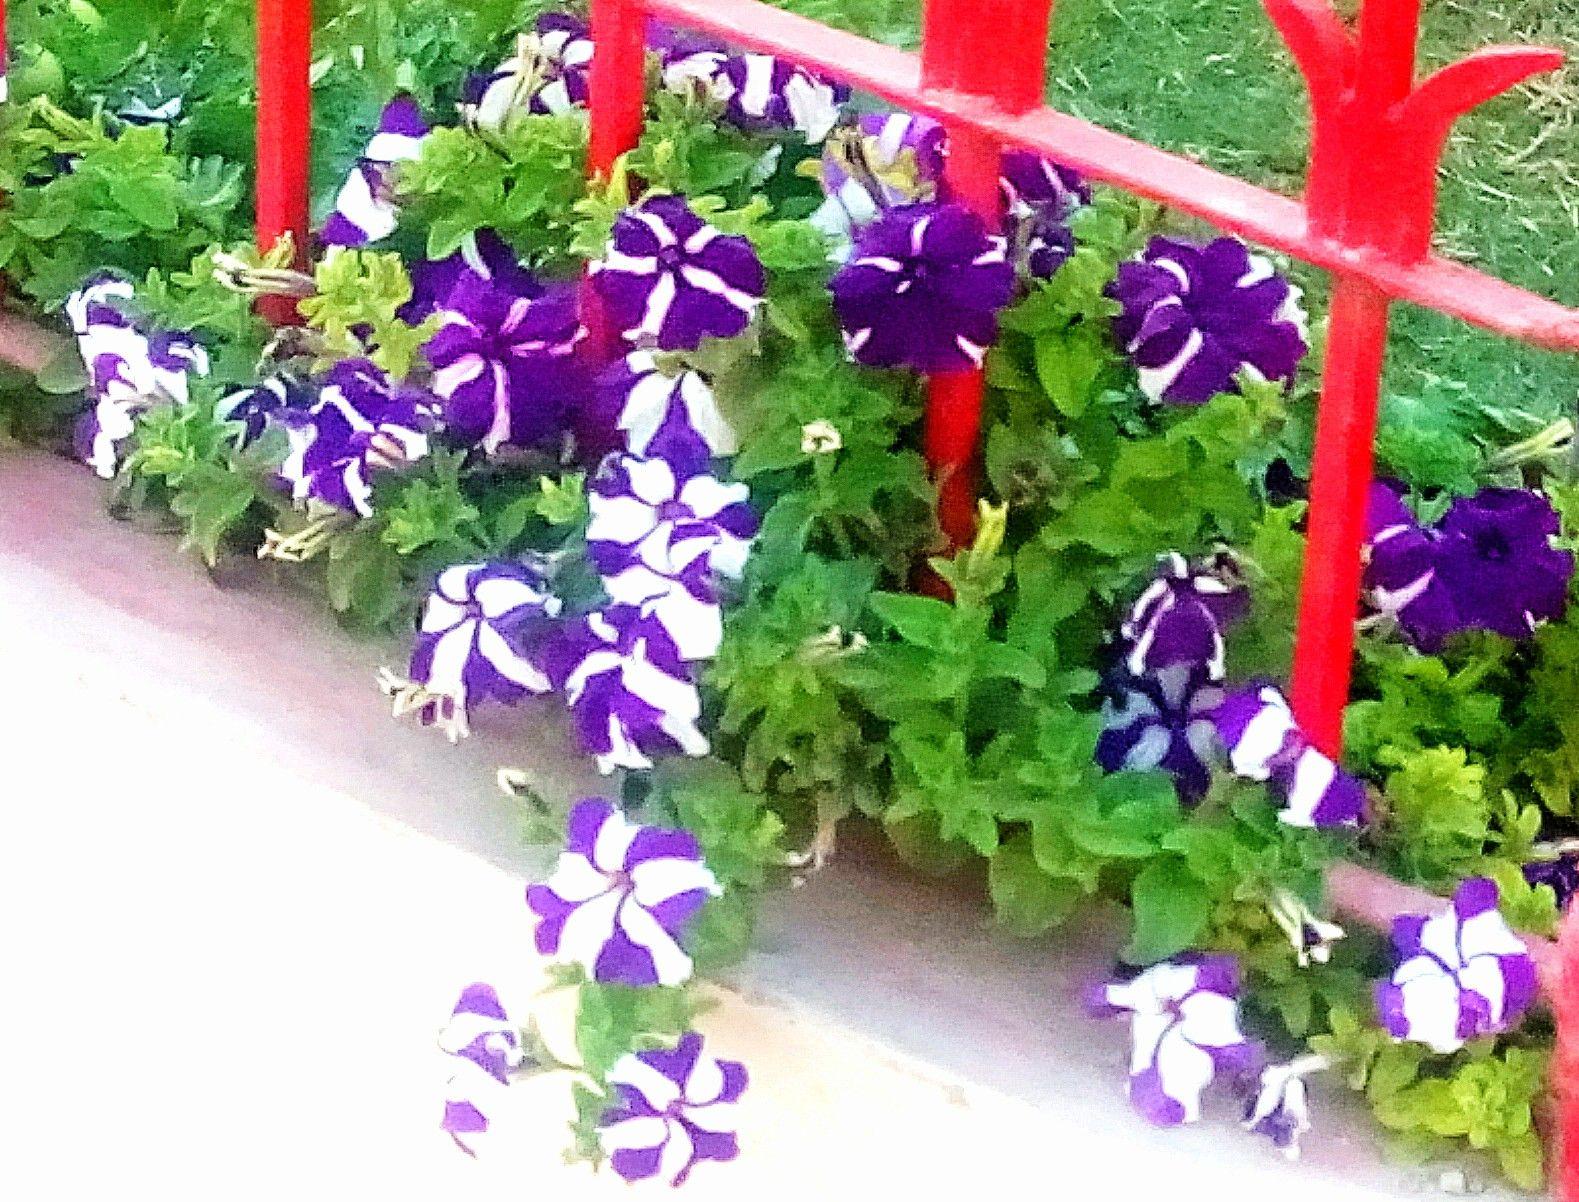 Pretty Petunia Captured By Me While Having A Walk Karachi Pakistan Petunias Flowers Plants